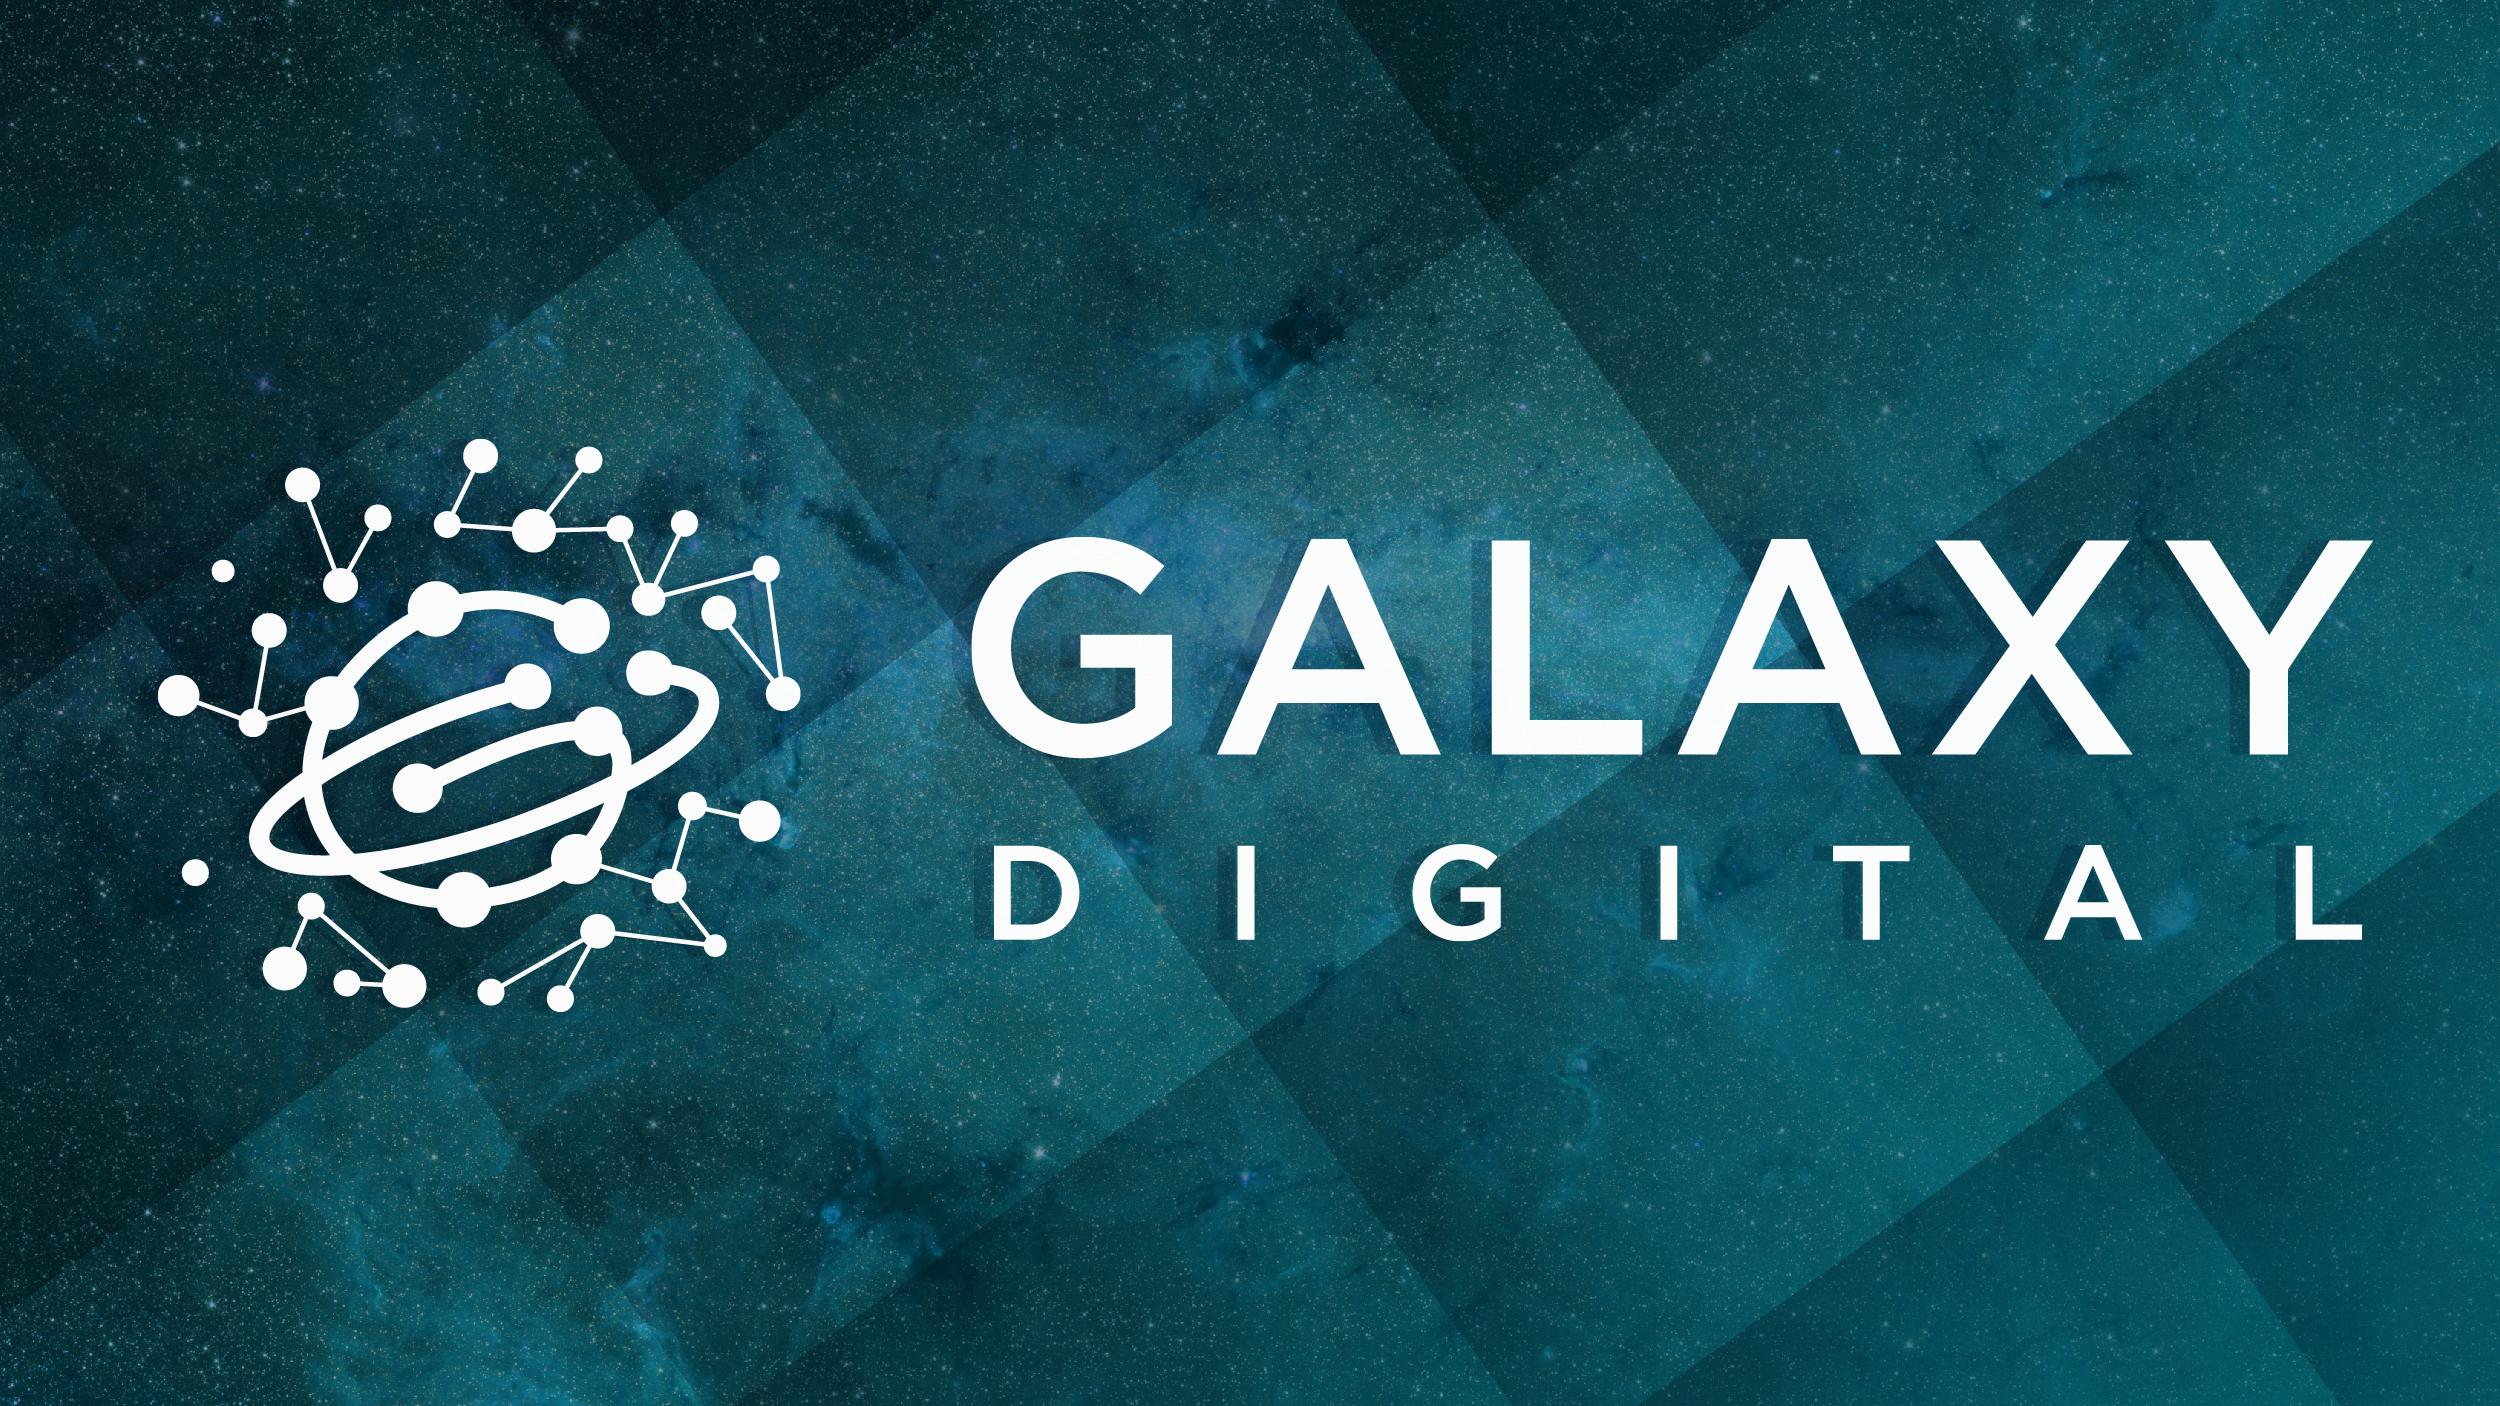 SIX Digital Exchange's CEO joins Galaxy Digital as head of Europe